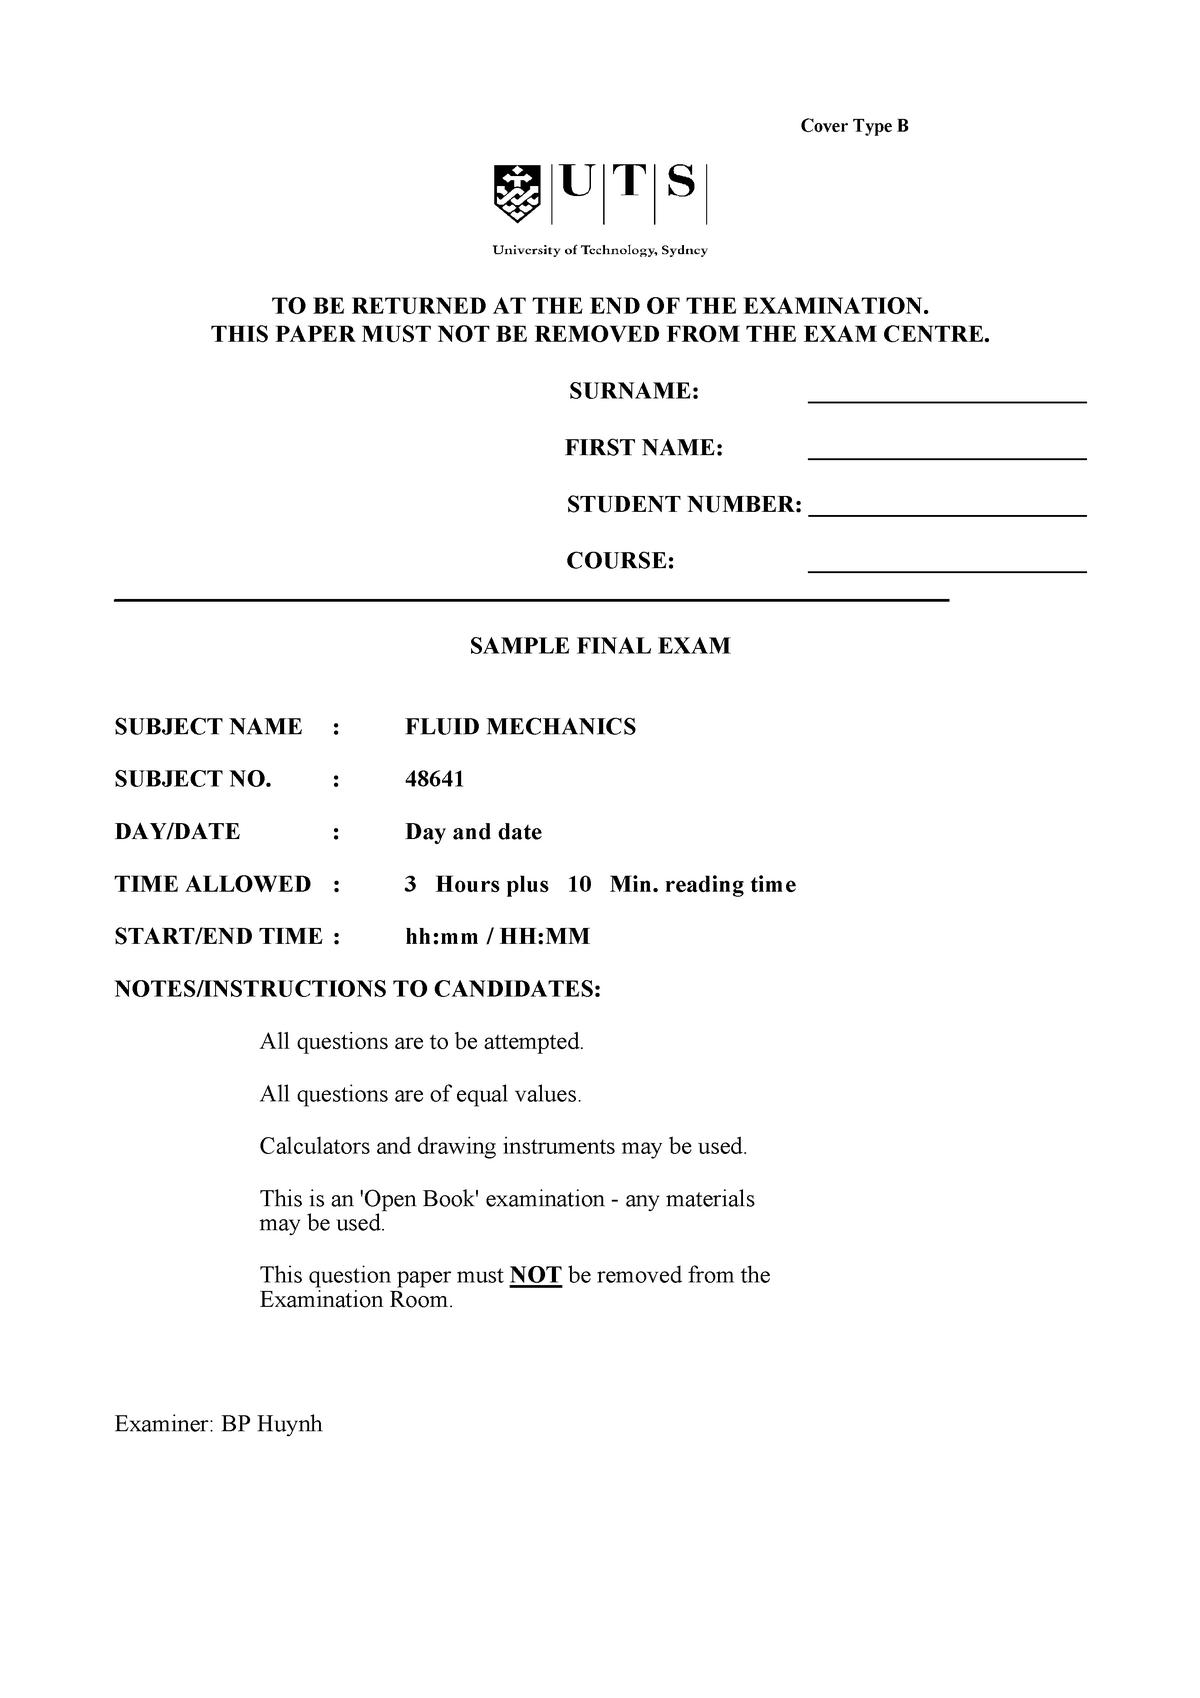 Exam 2016 - 048641 : Fluid Mechanics - StuDocu